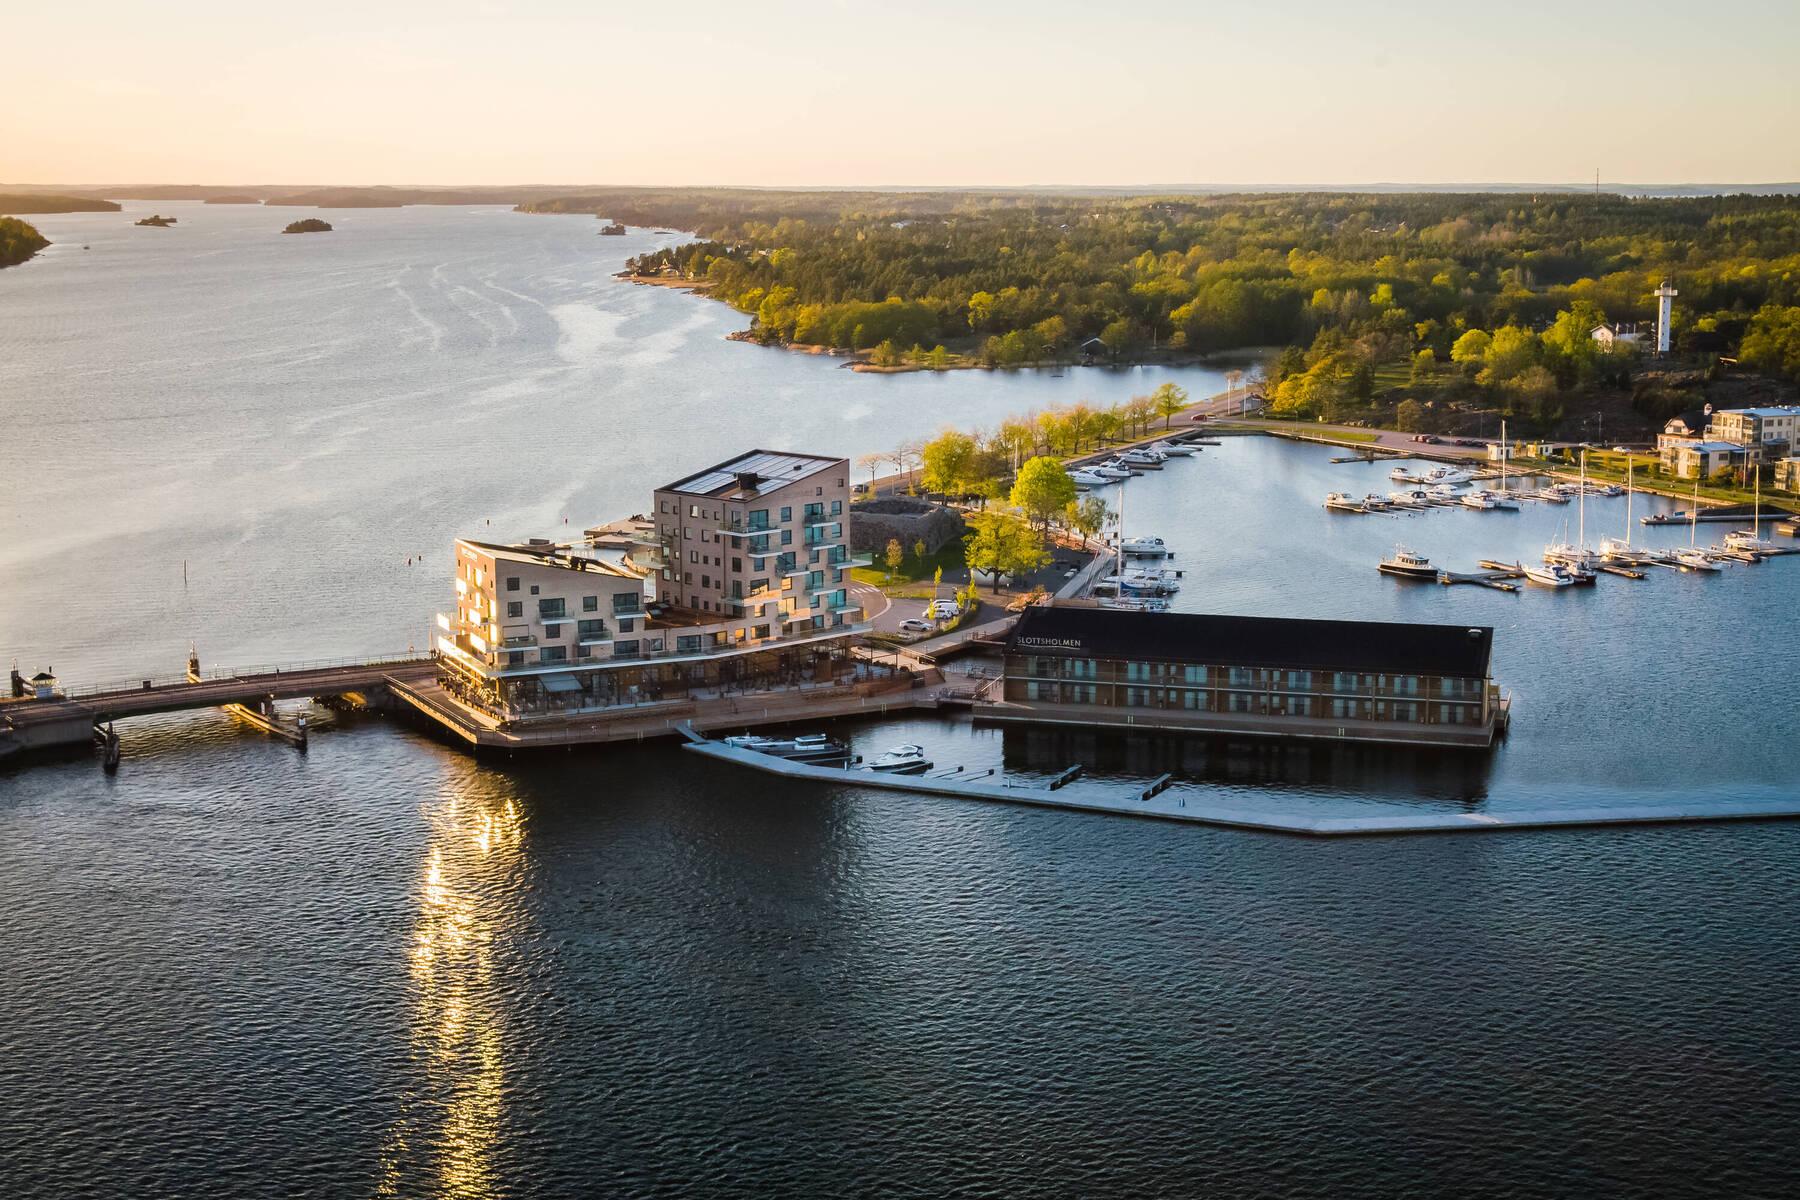 Slottsholmen On Water